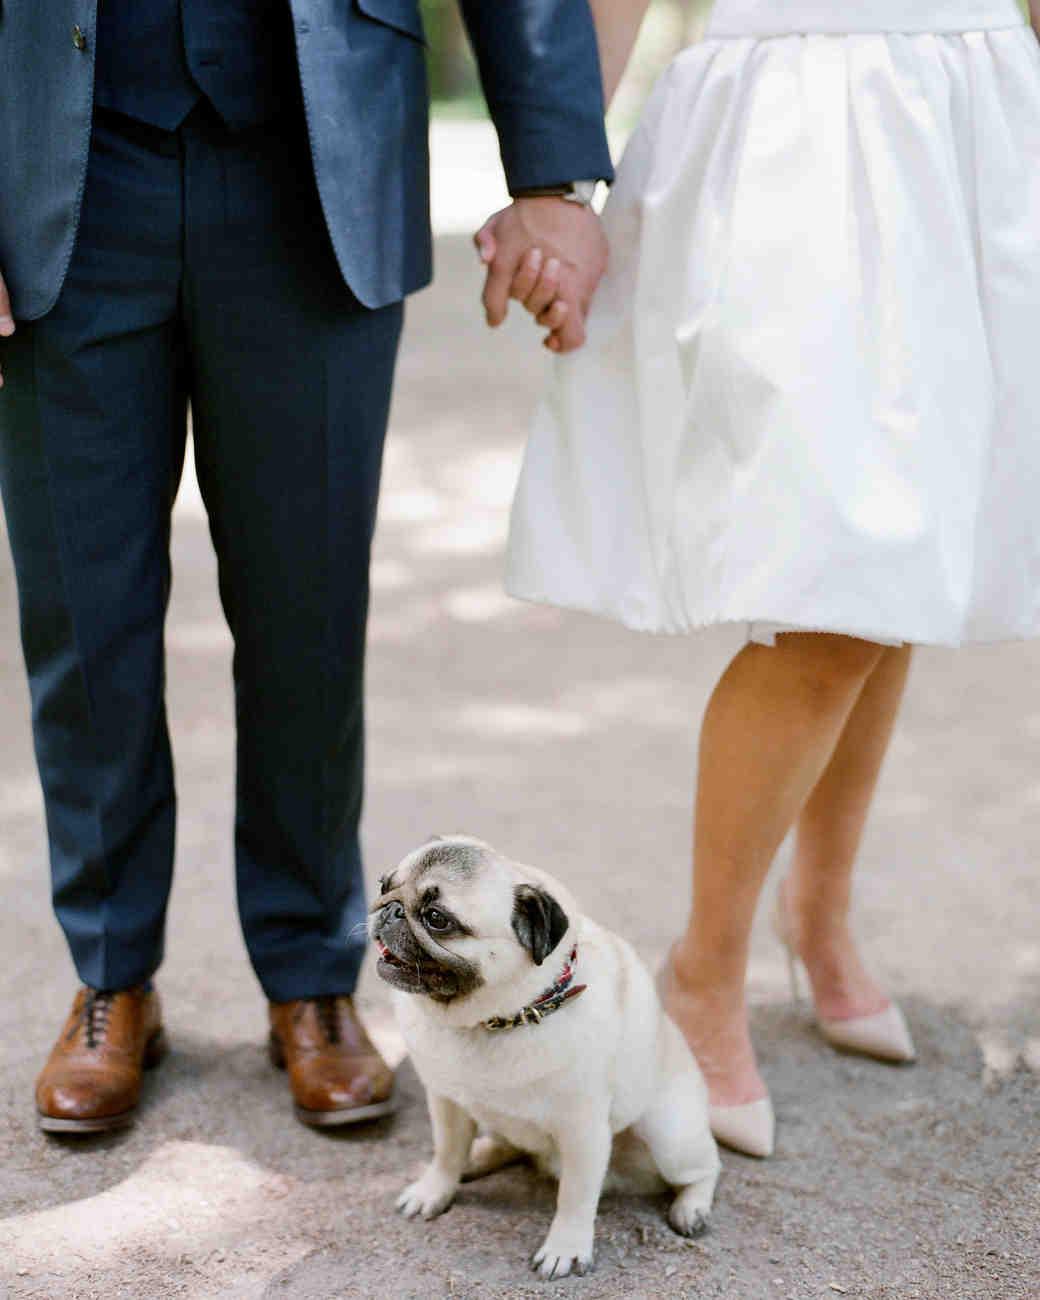 stacey-eric-wedding-dog-12-s111513-1014.jpg